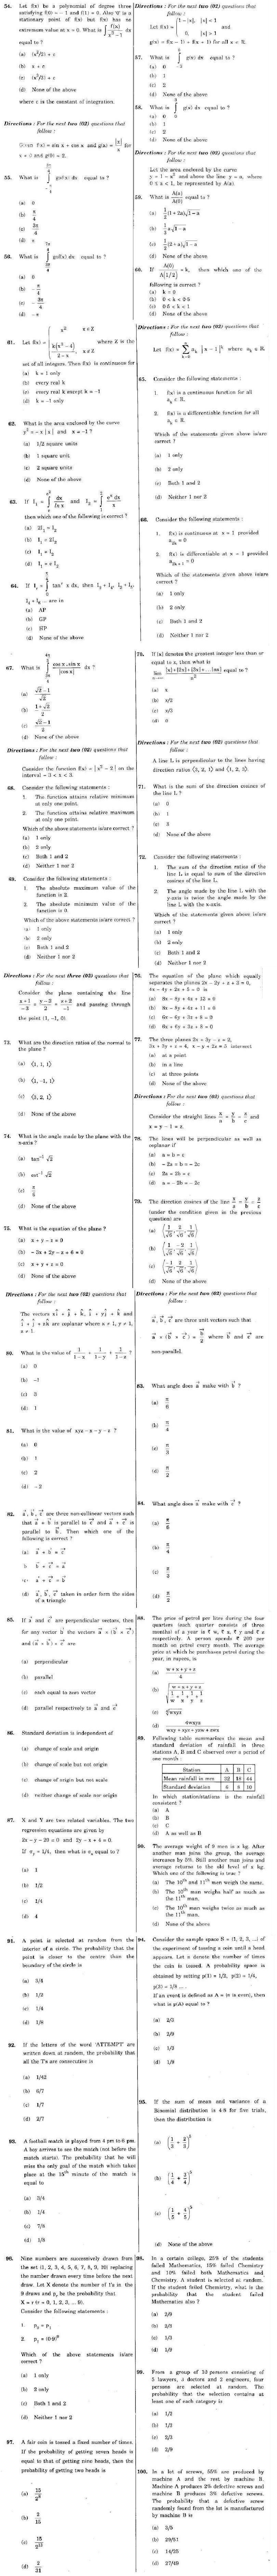 SCRA 2013 Mathematics Question Paper